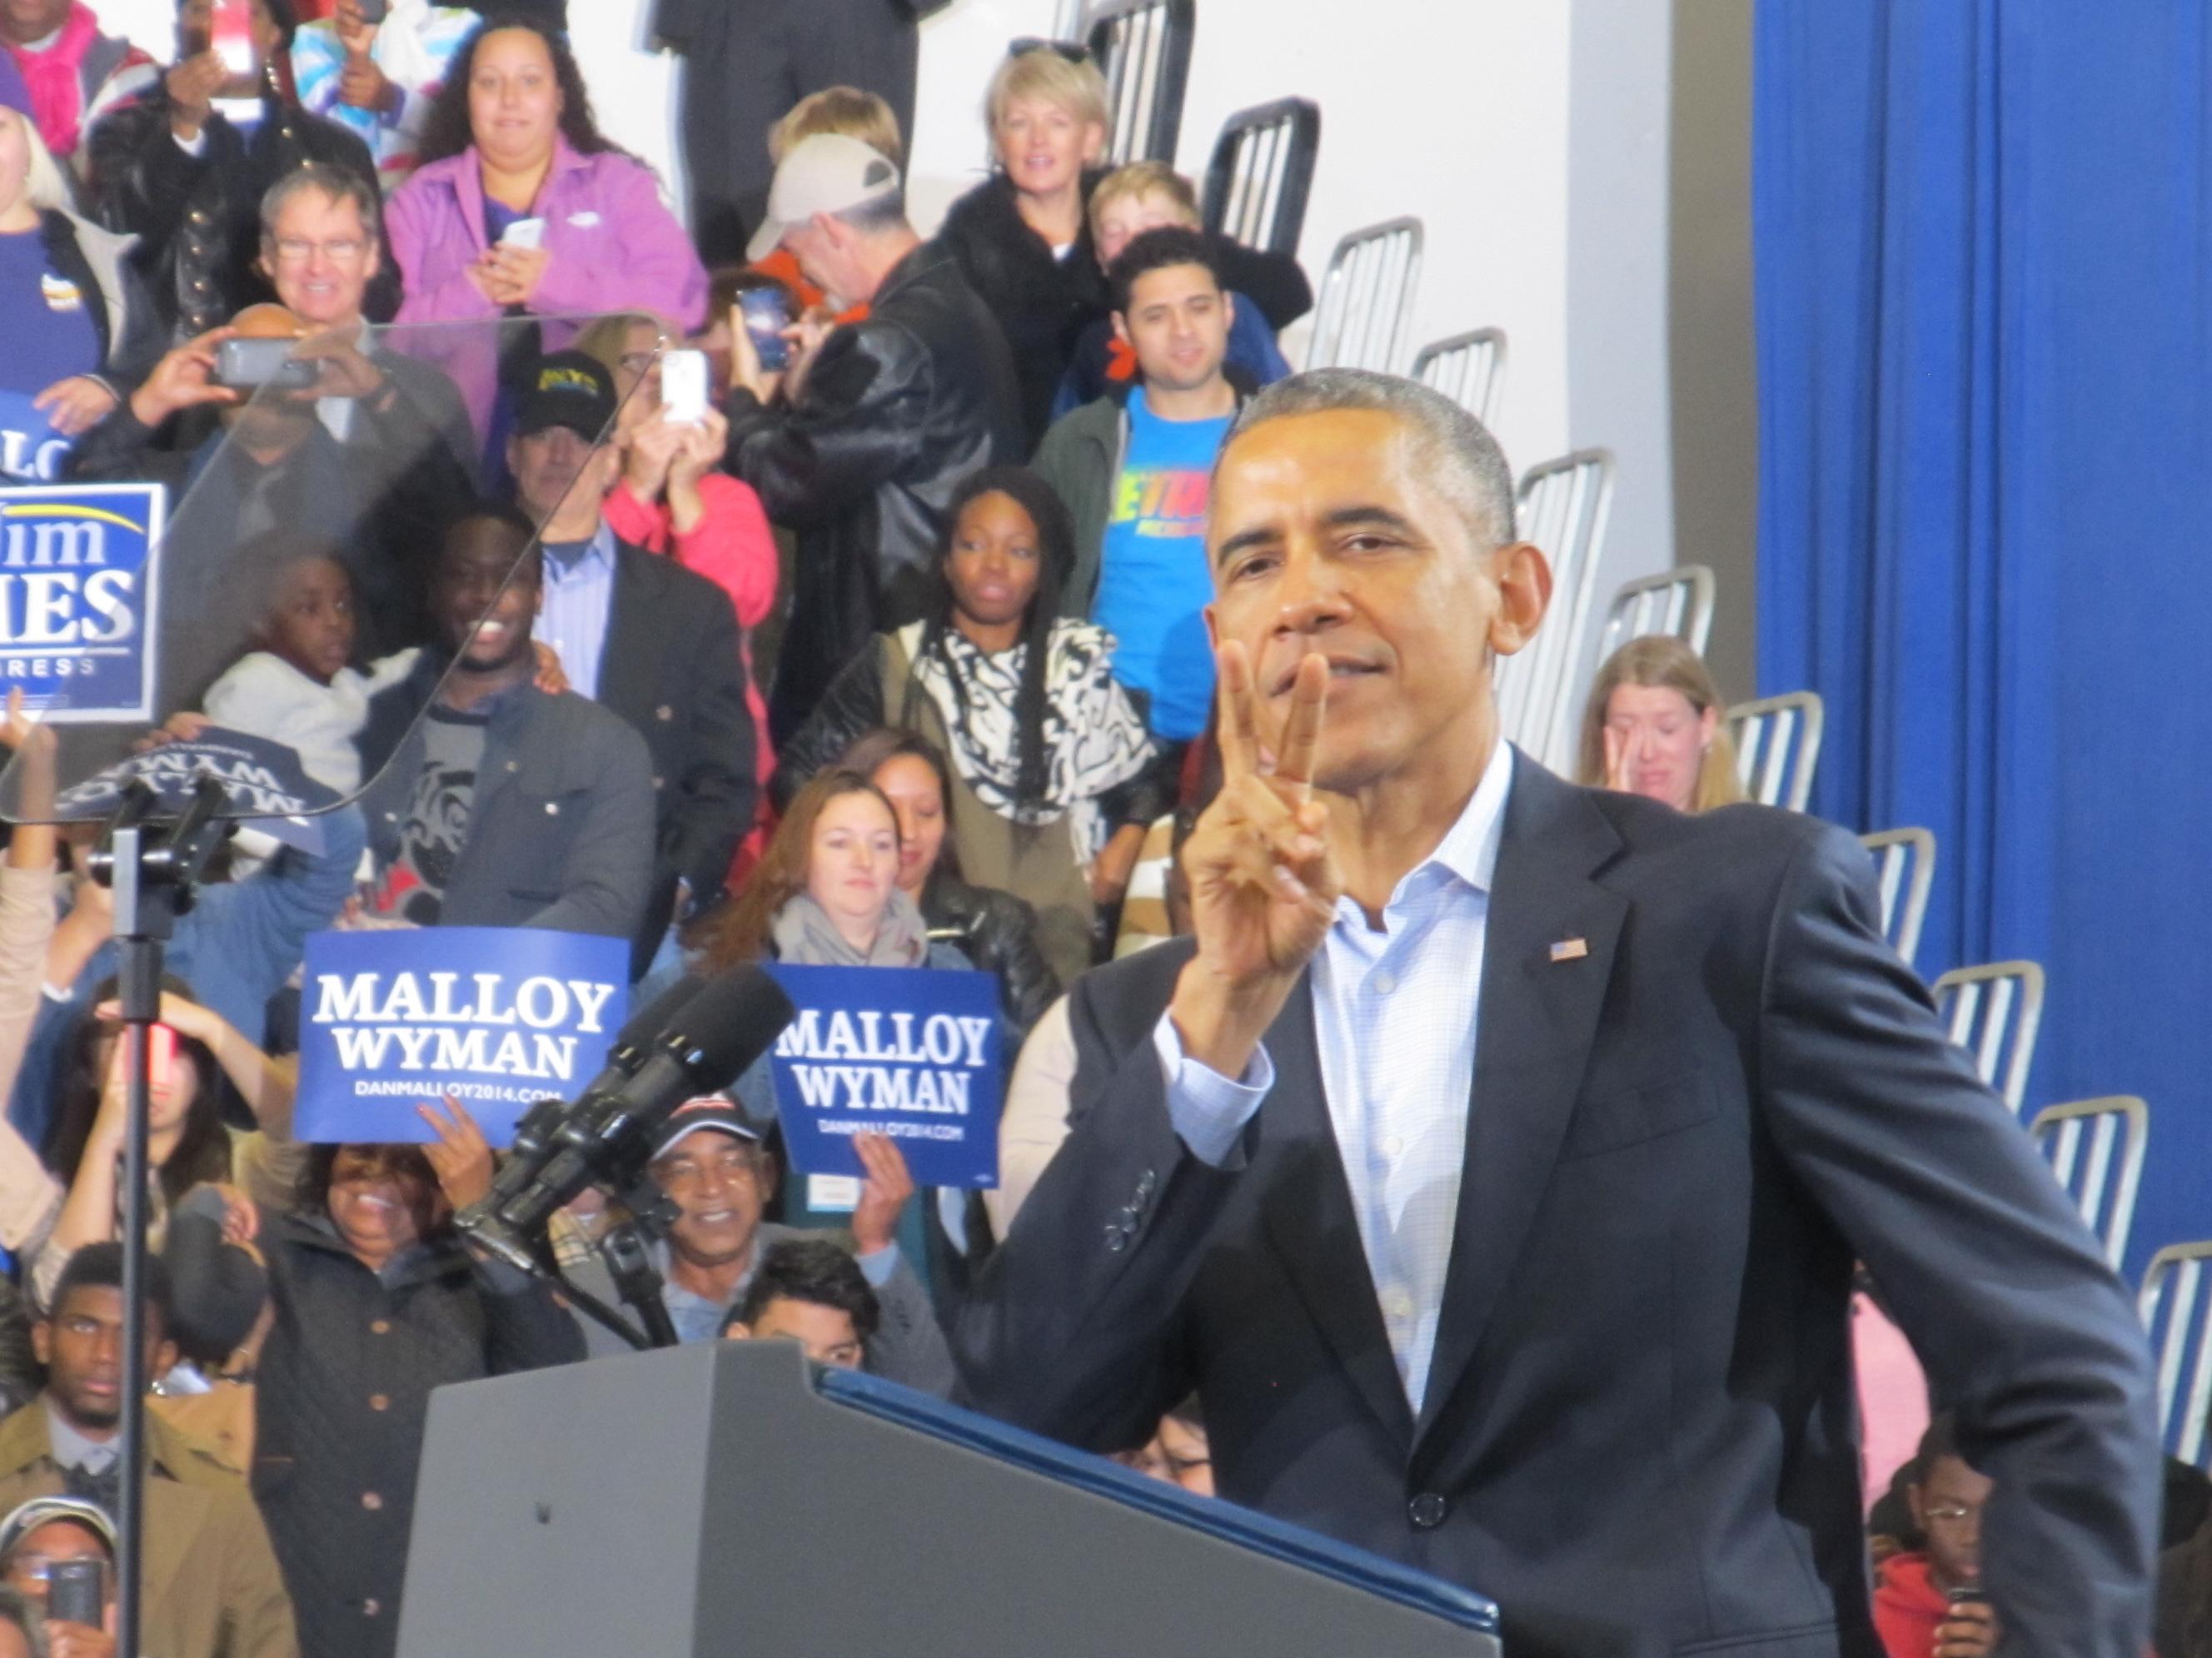 Two days 'til election, says President Obama.